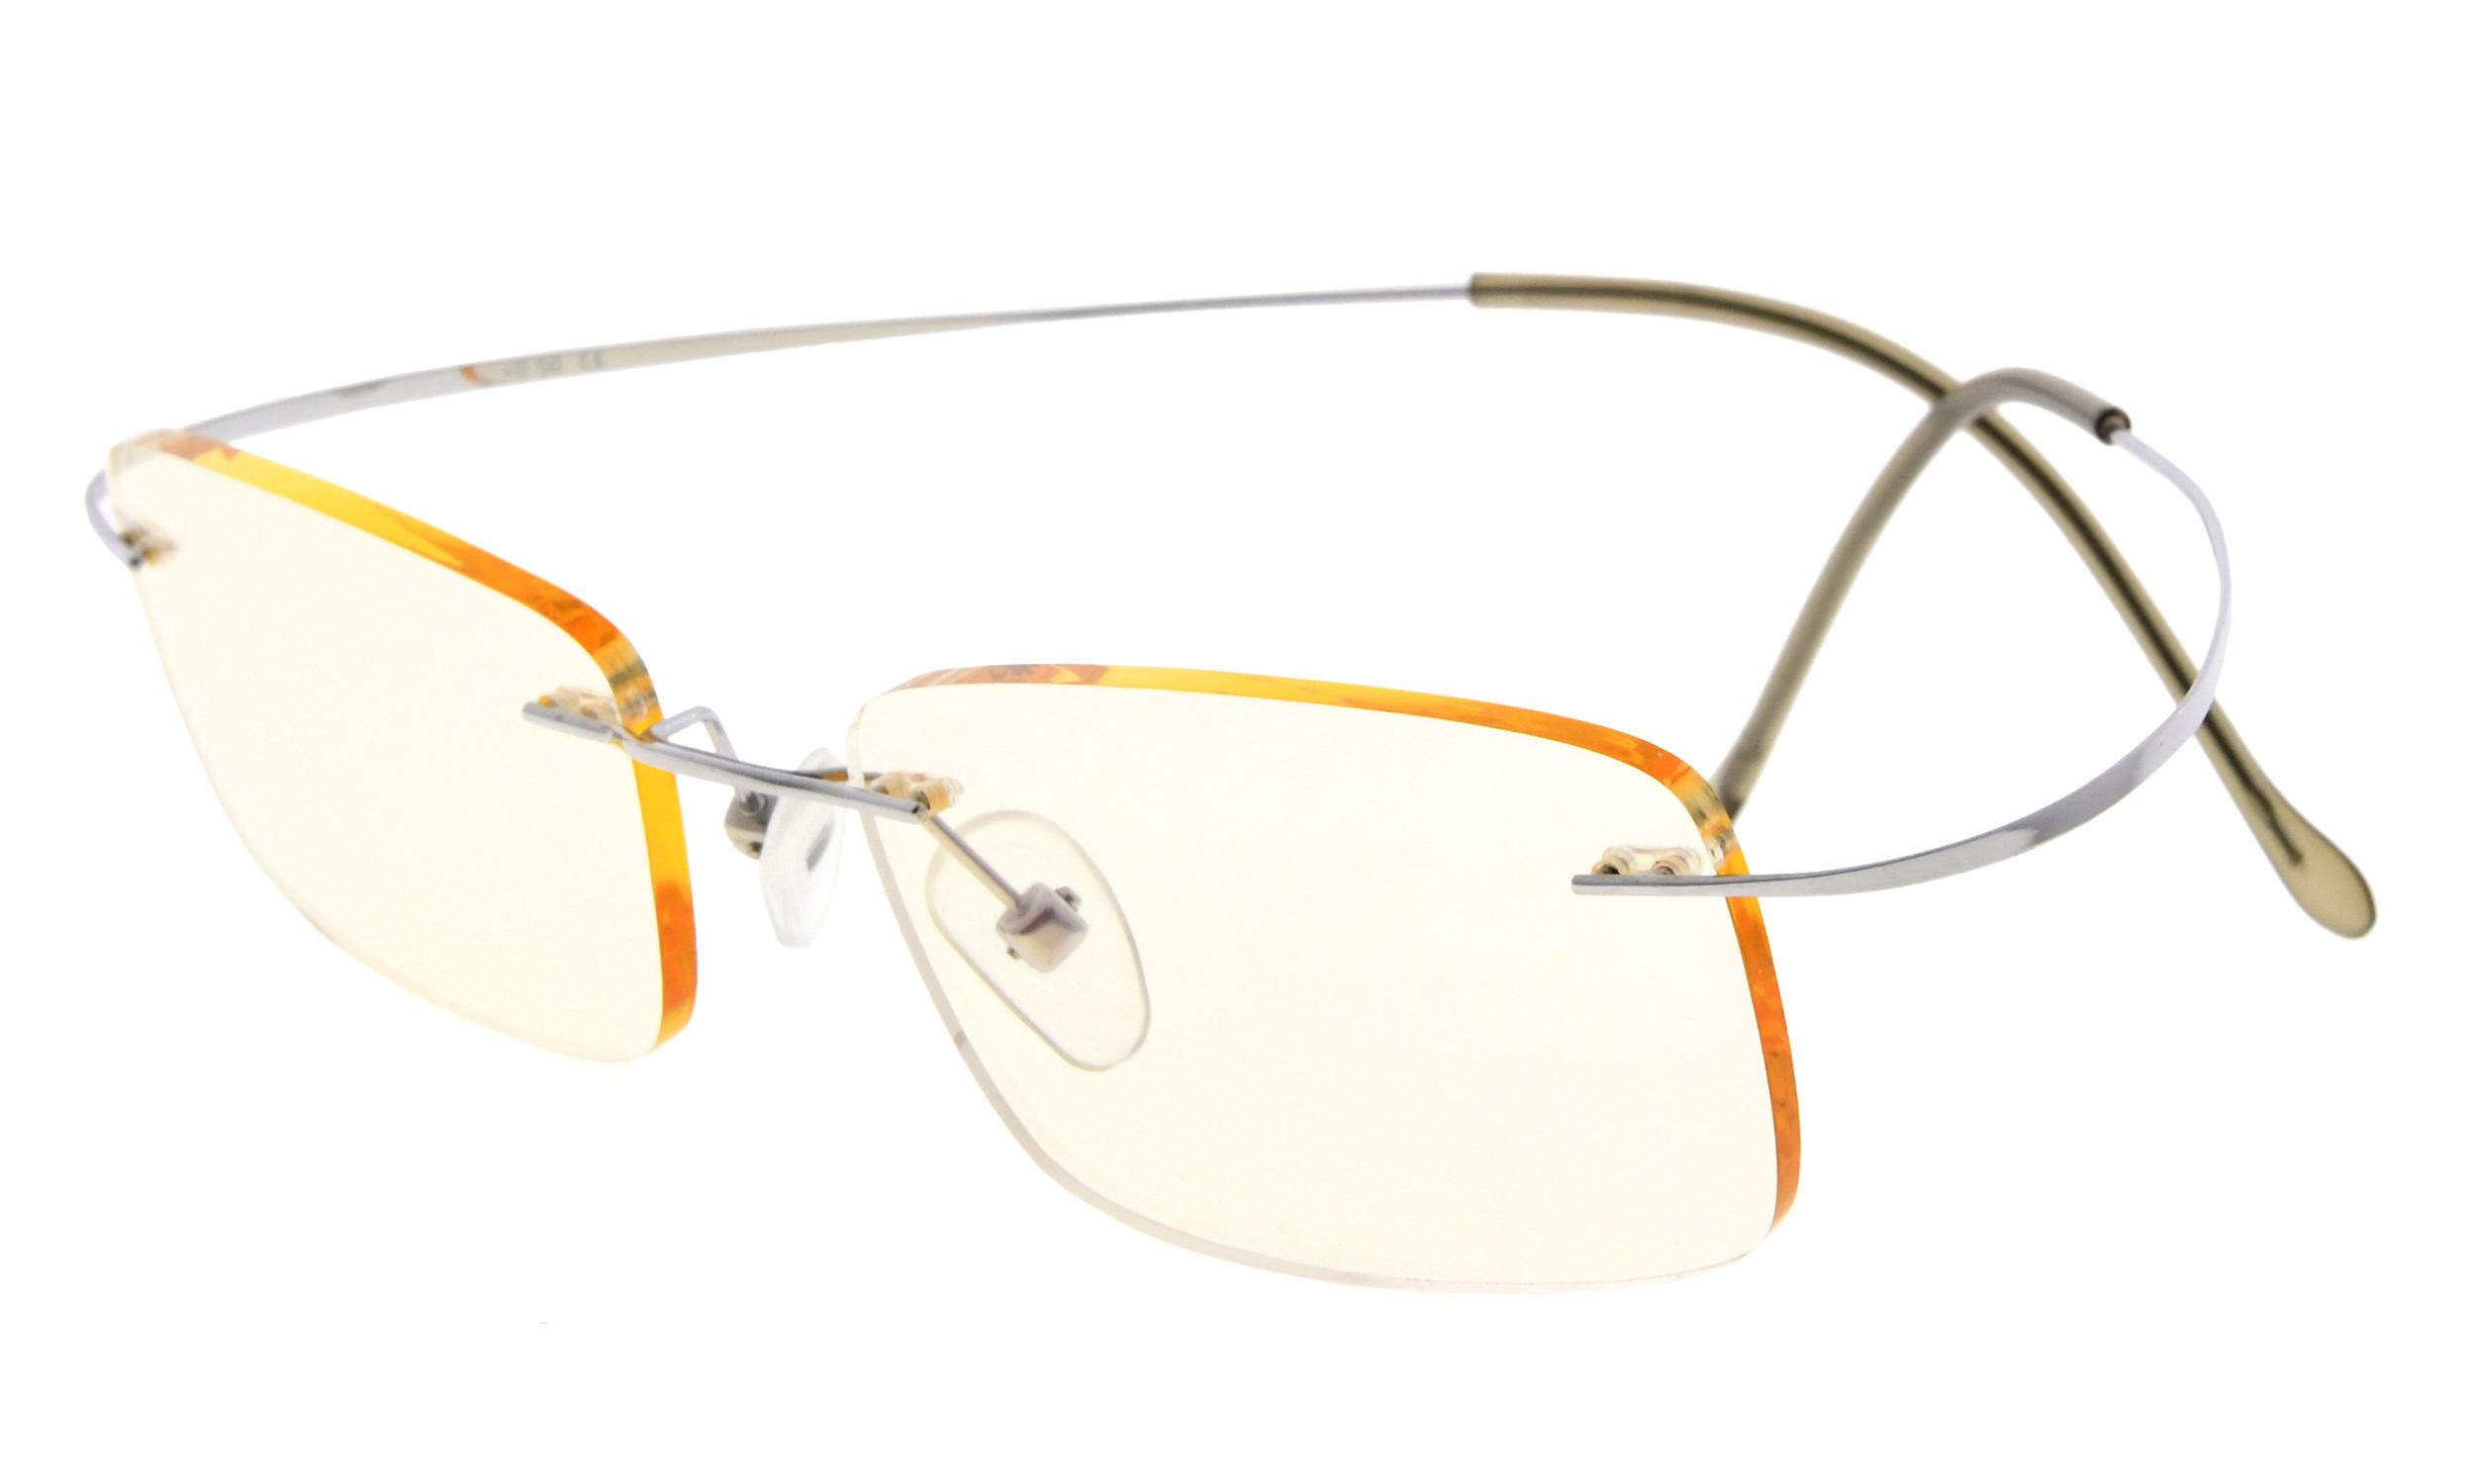 c03d020071de Eyekepper Computer Reading Glasses UV Protection Titanium Rimless Stylish Readers  Women Men Silver CG1508